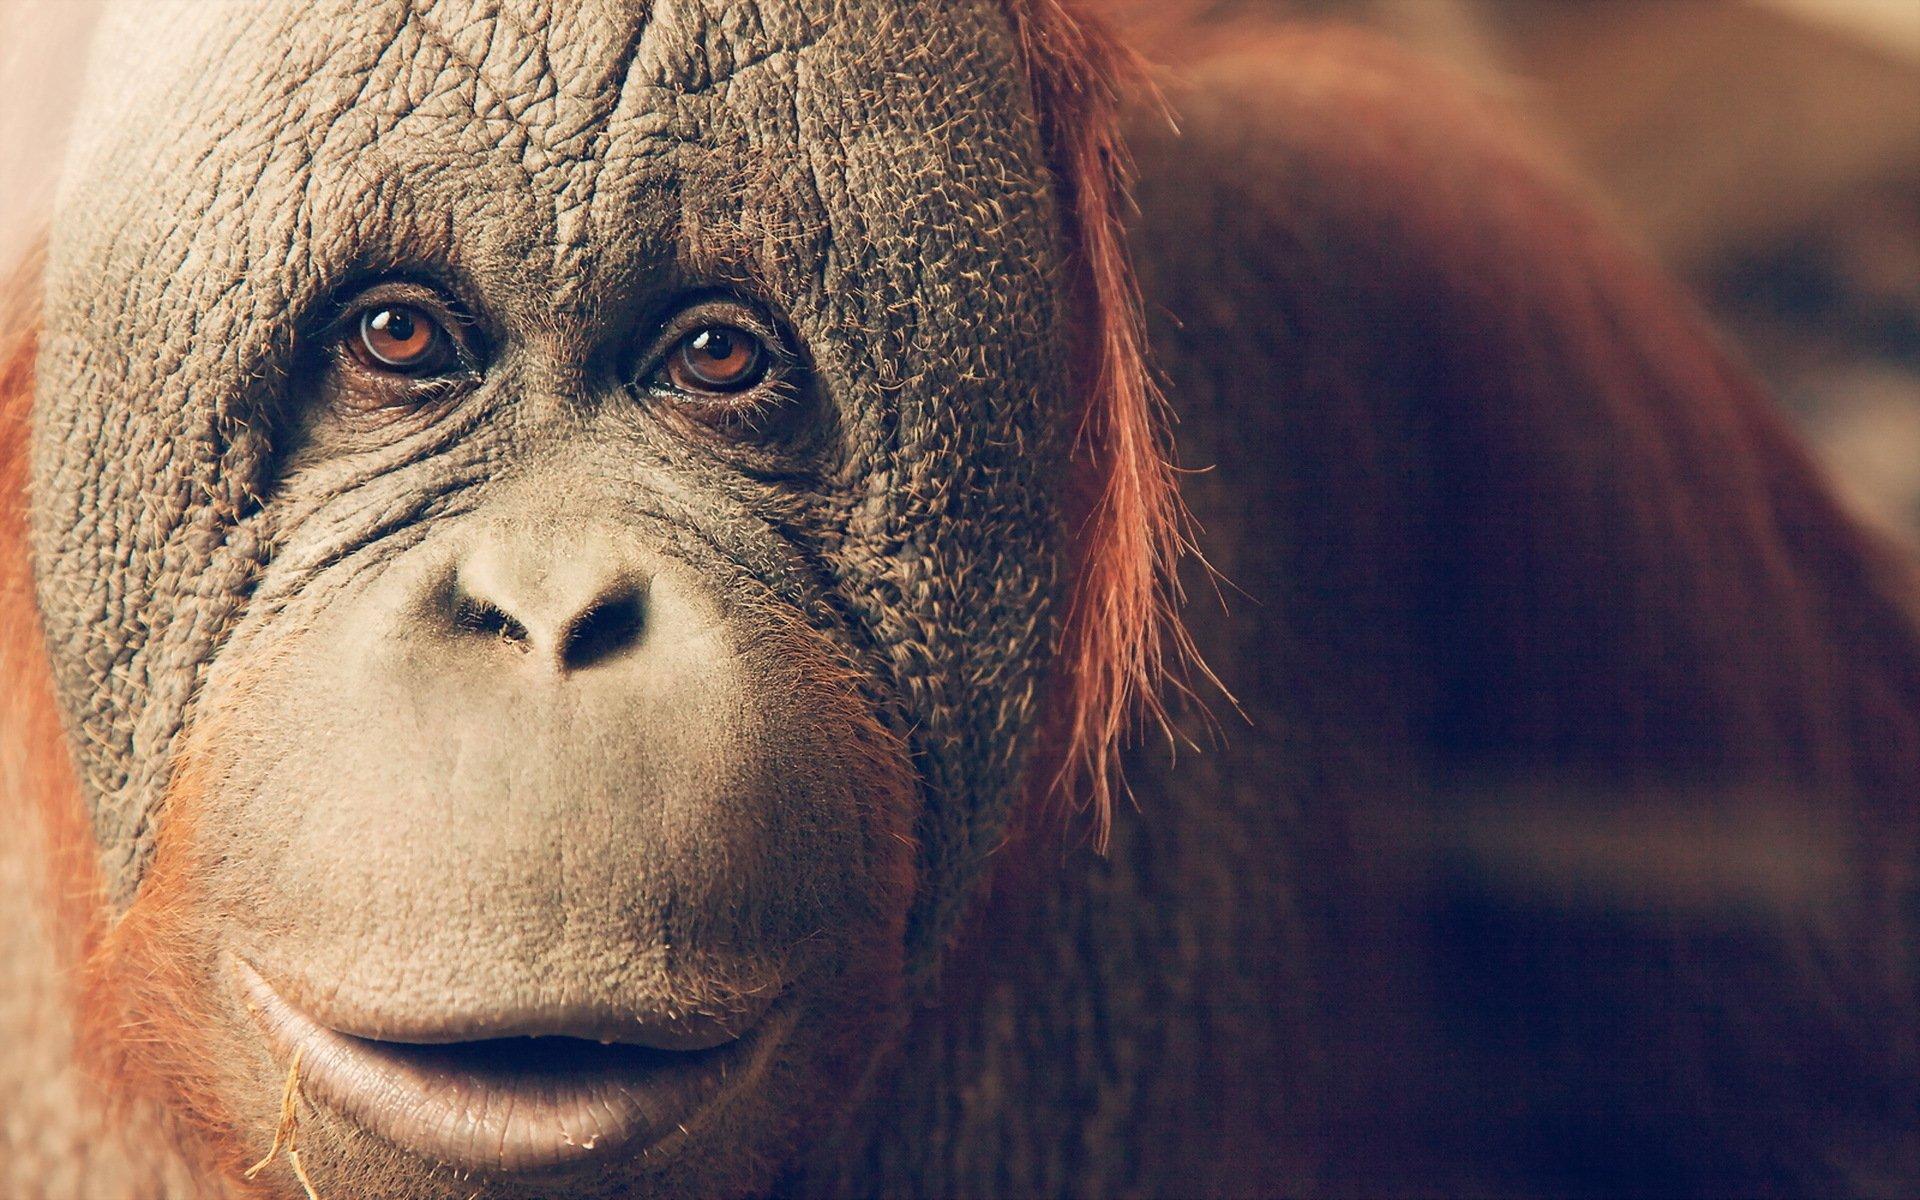 Orangutan Hd Wallpaper Background Image 1920x1200 Id773069